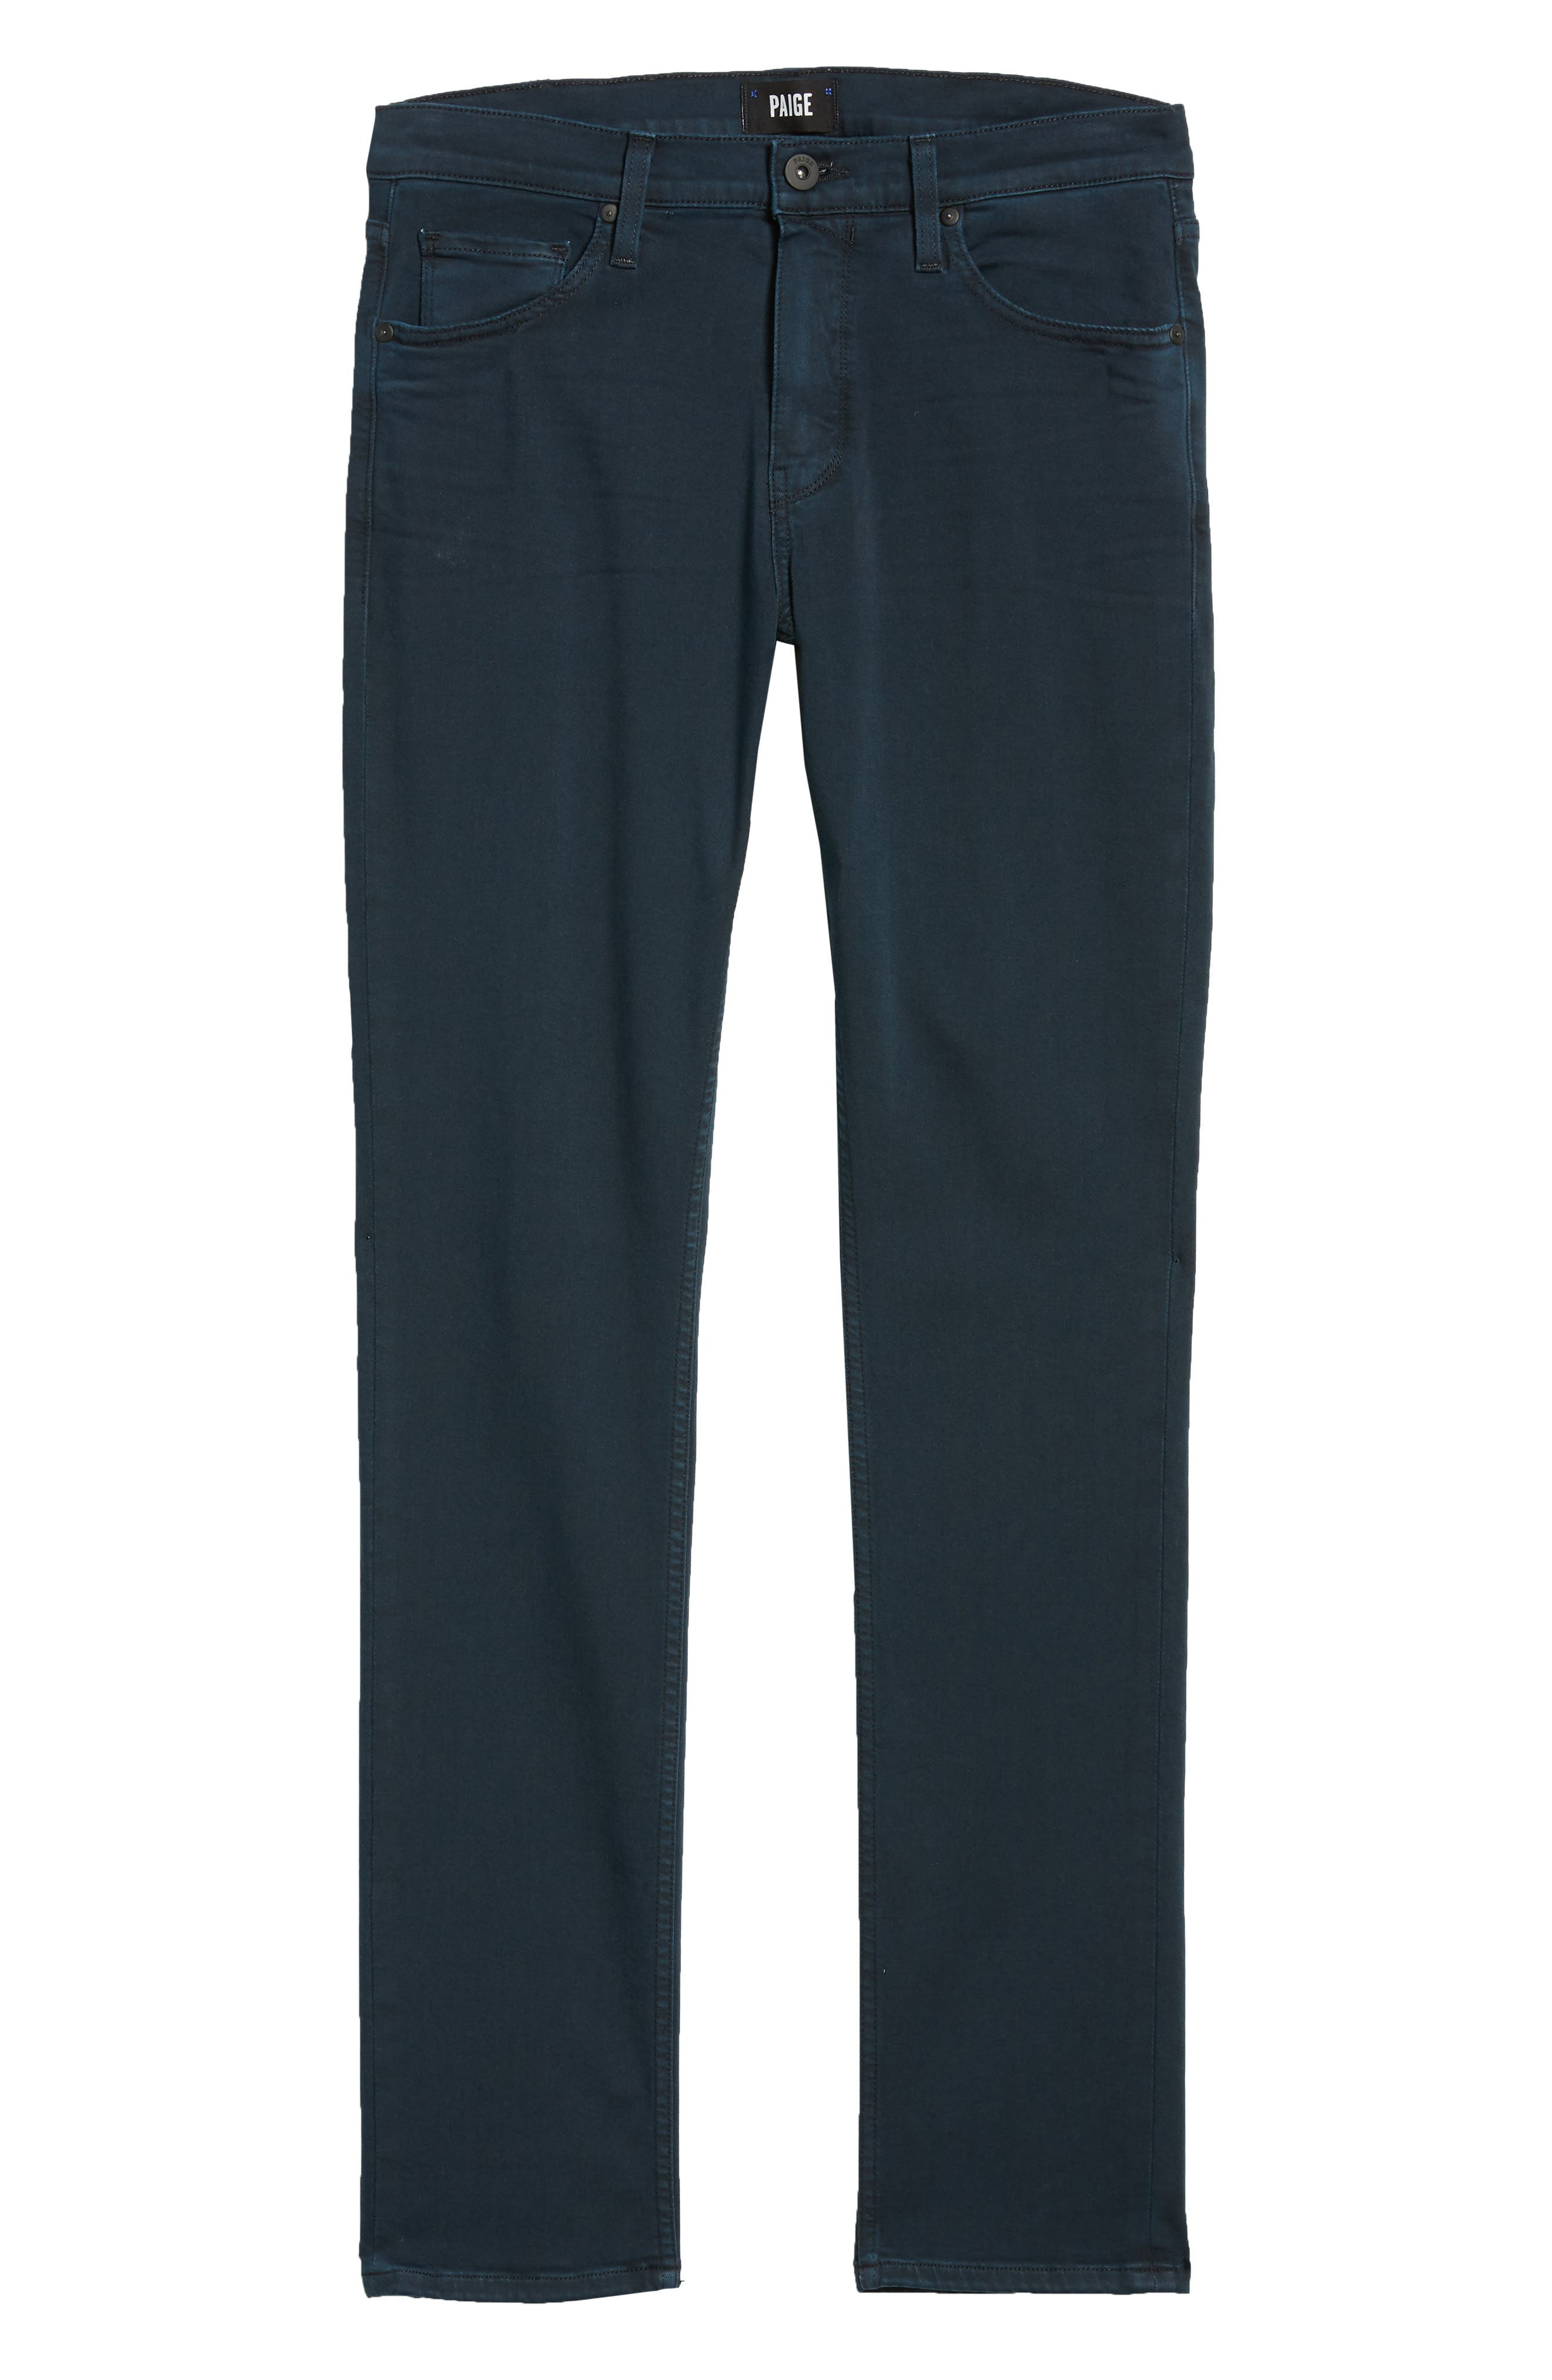 Transcend - Lennox Slim Jeans,                             Alternate thumbnail 6, color,                             401